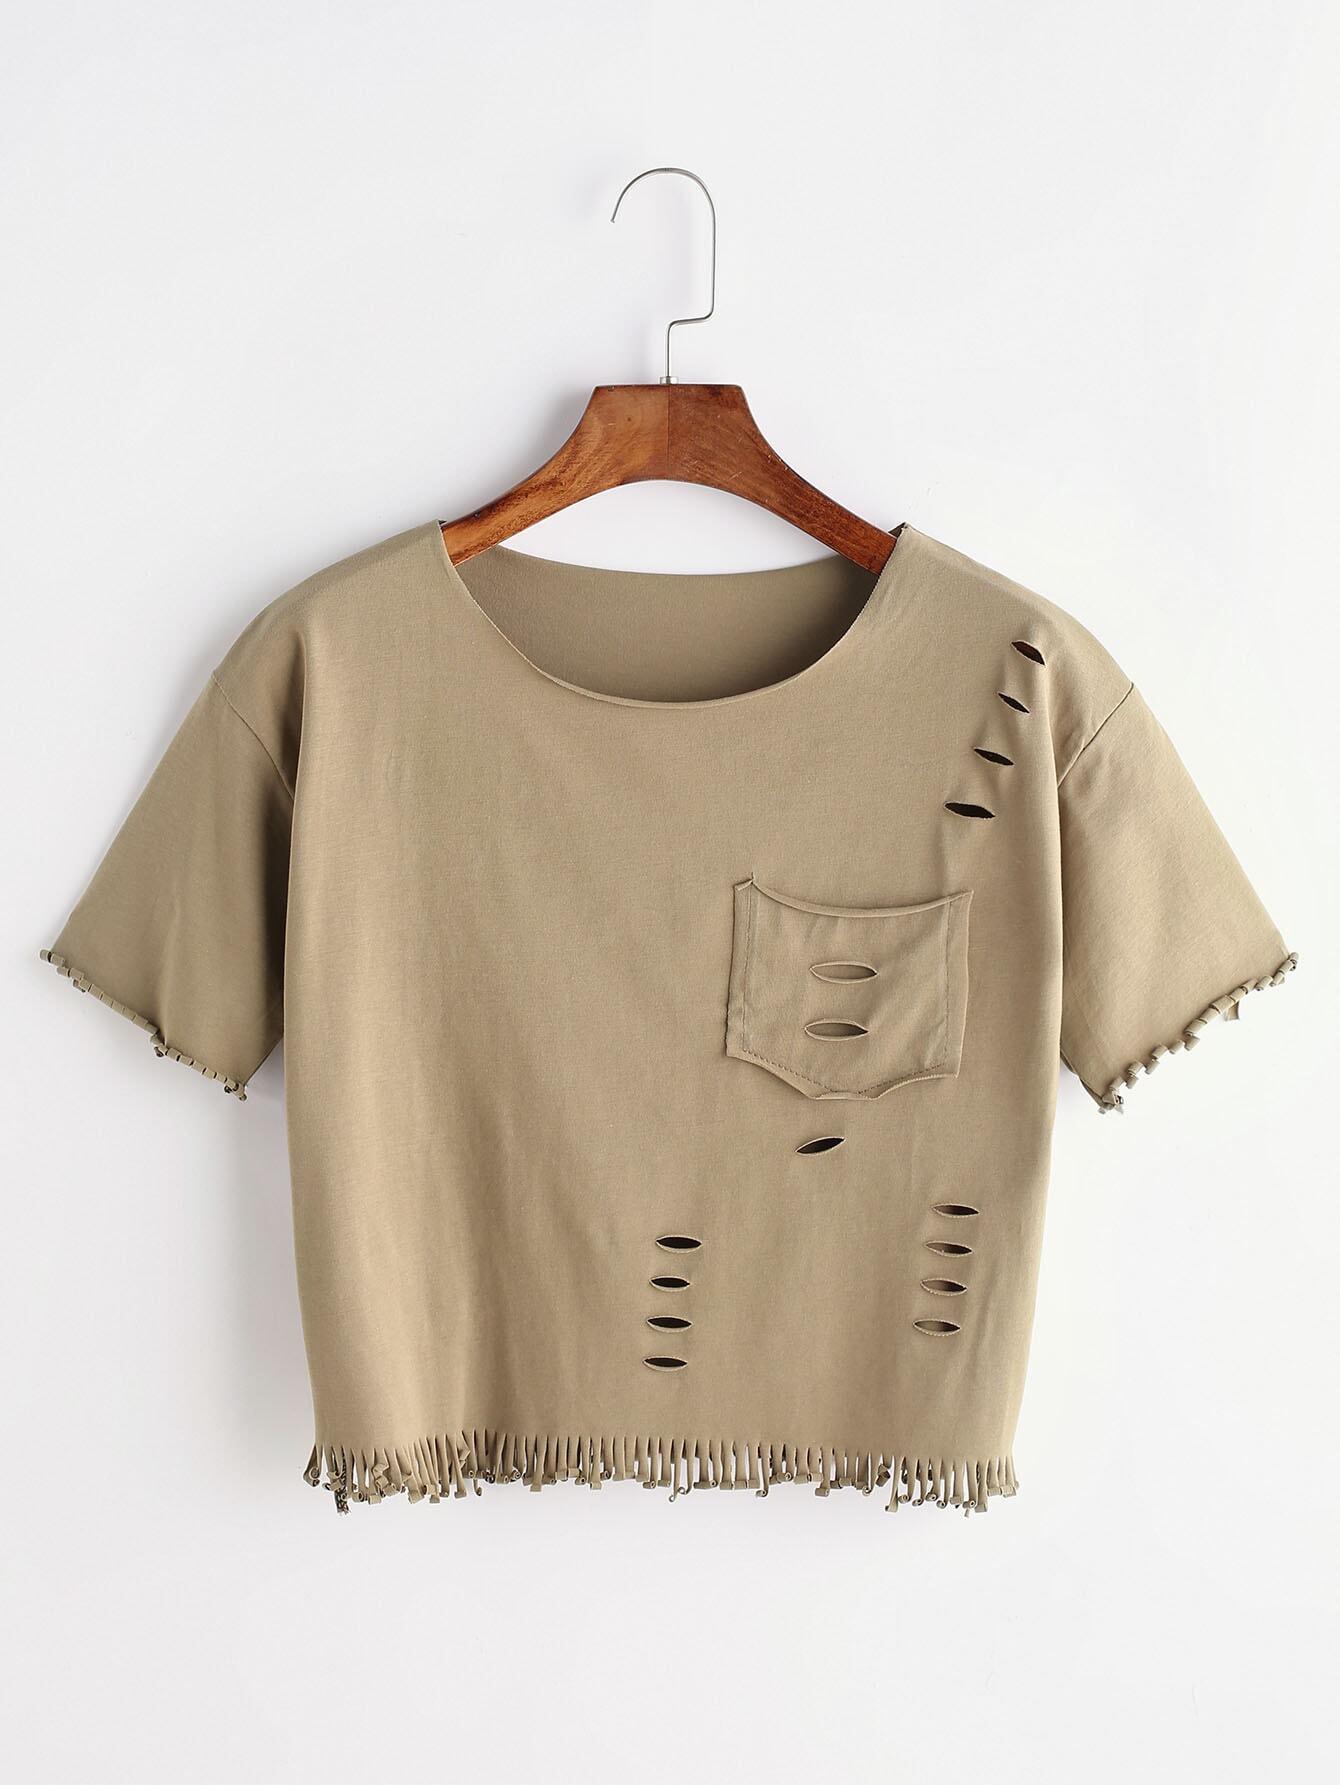 ripped fringe t shirt with pocketfor women romwe. Black Bedroom Furniture Sets. Home Design Ideas